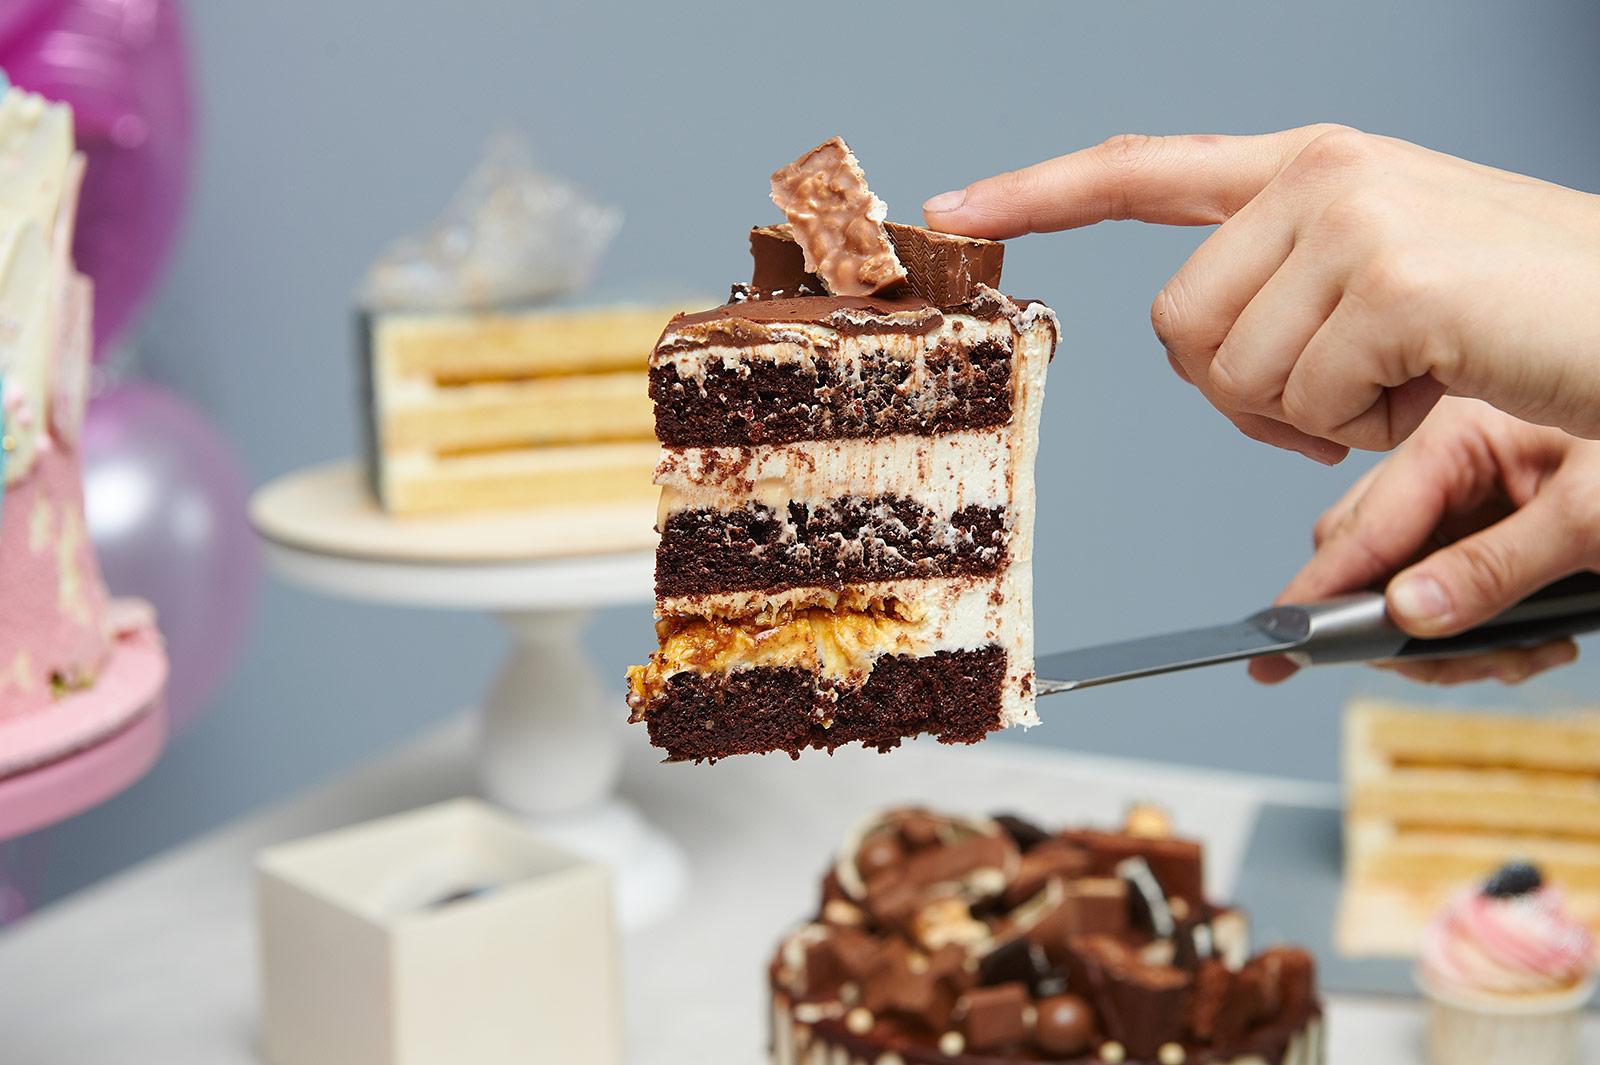 начинки тортов в разрезе